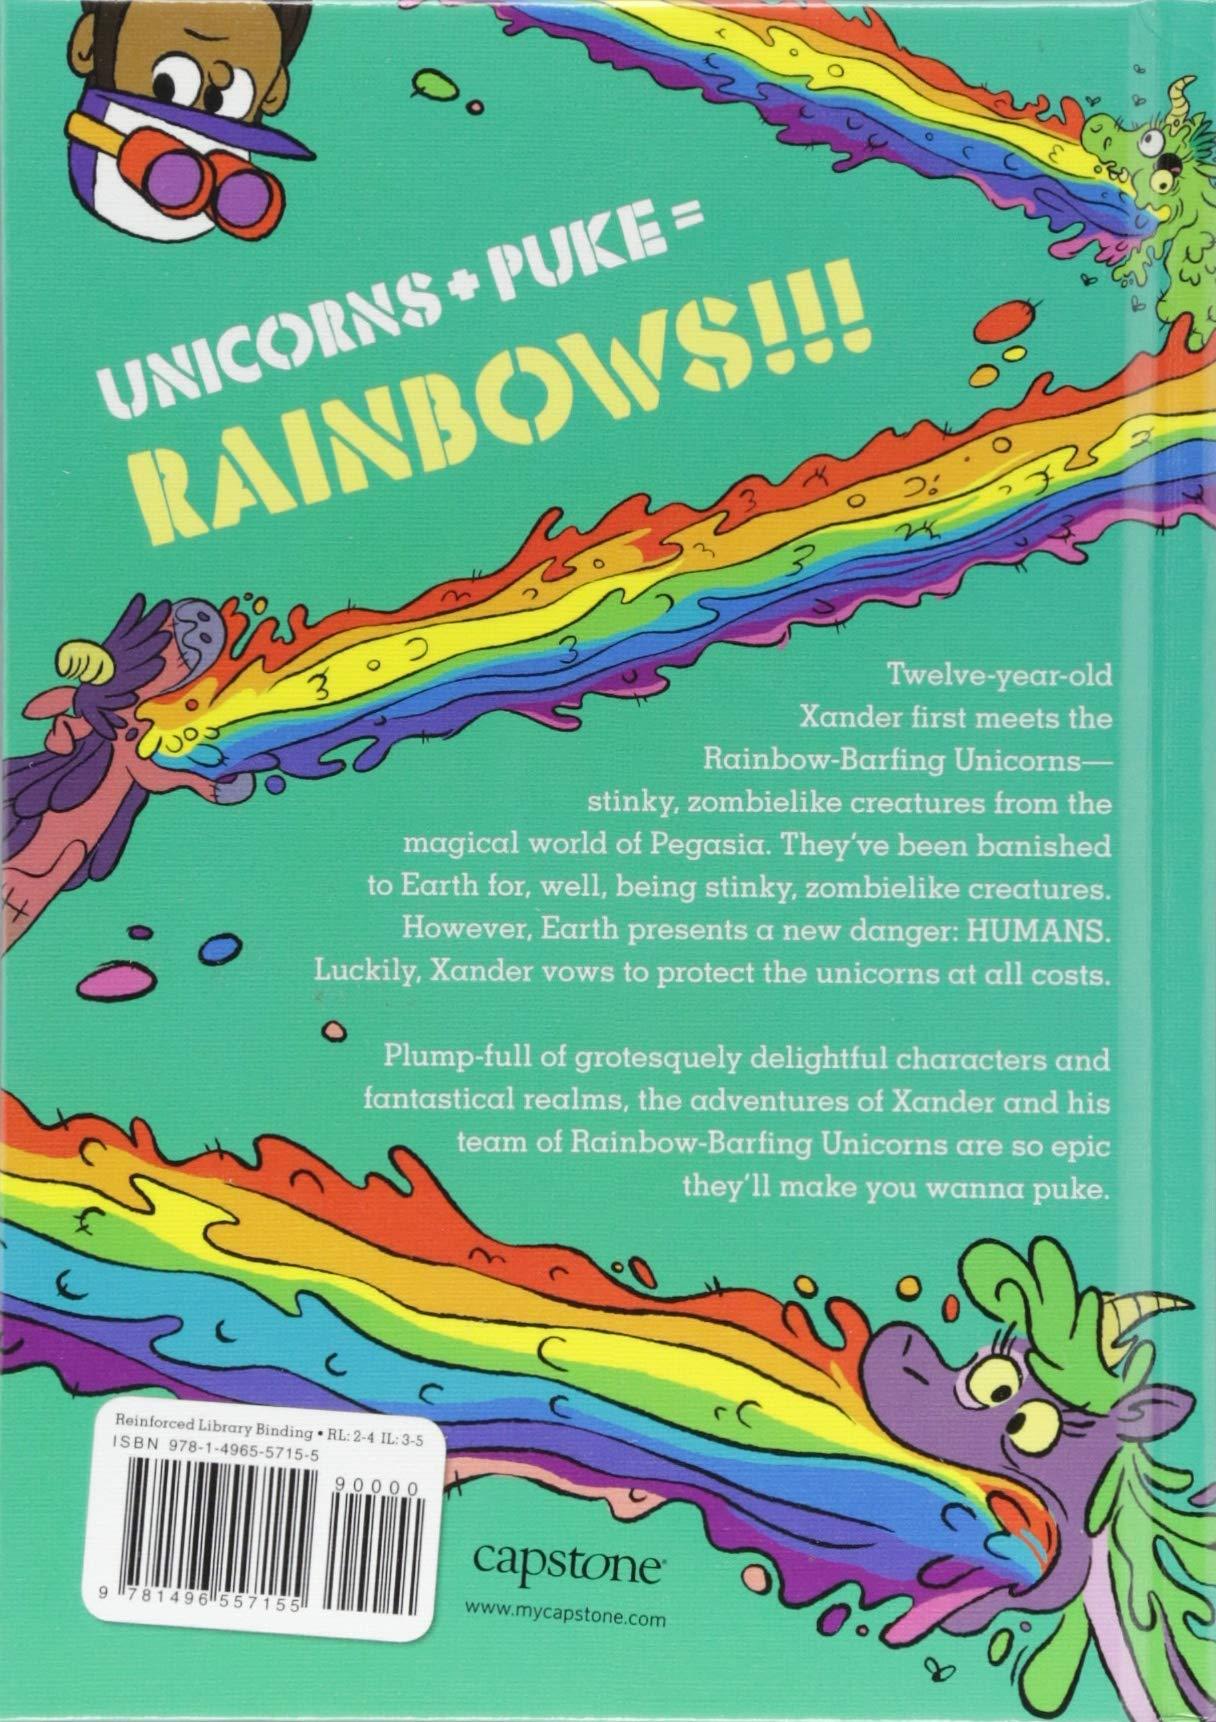 Magic Smells Awful (Xander and the Rainbow-Barfing Unicorns) 4